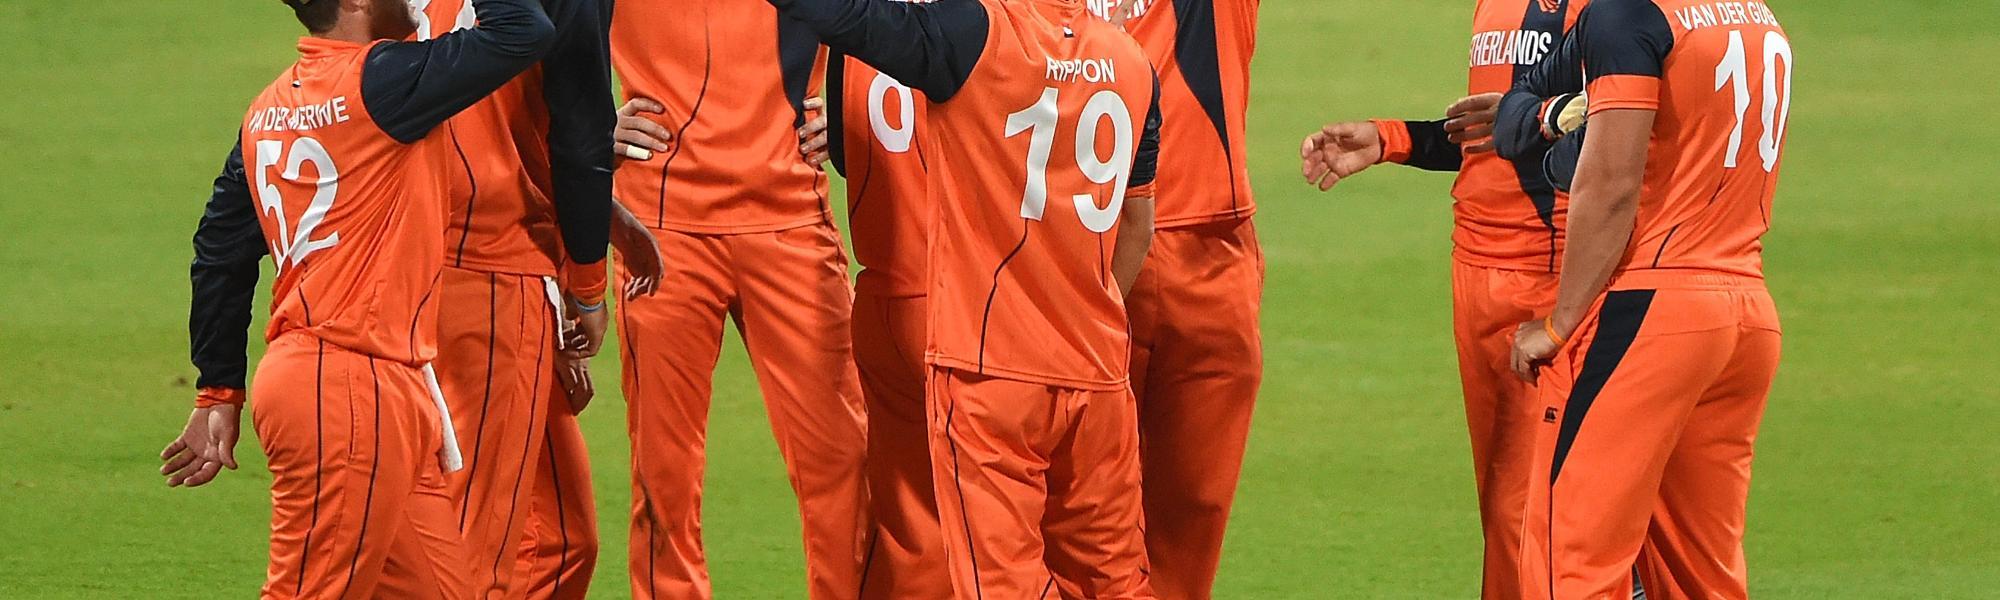 Team Netherlands